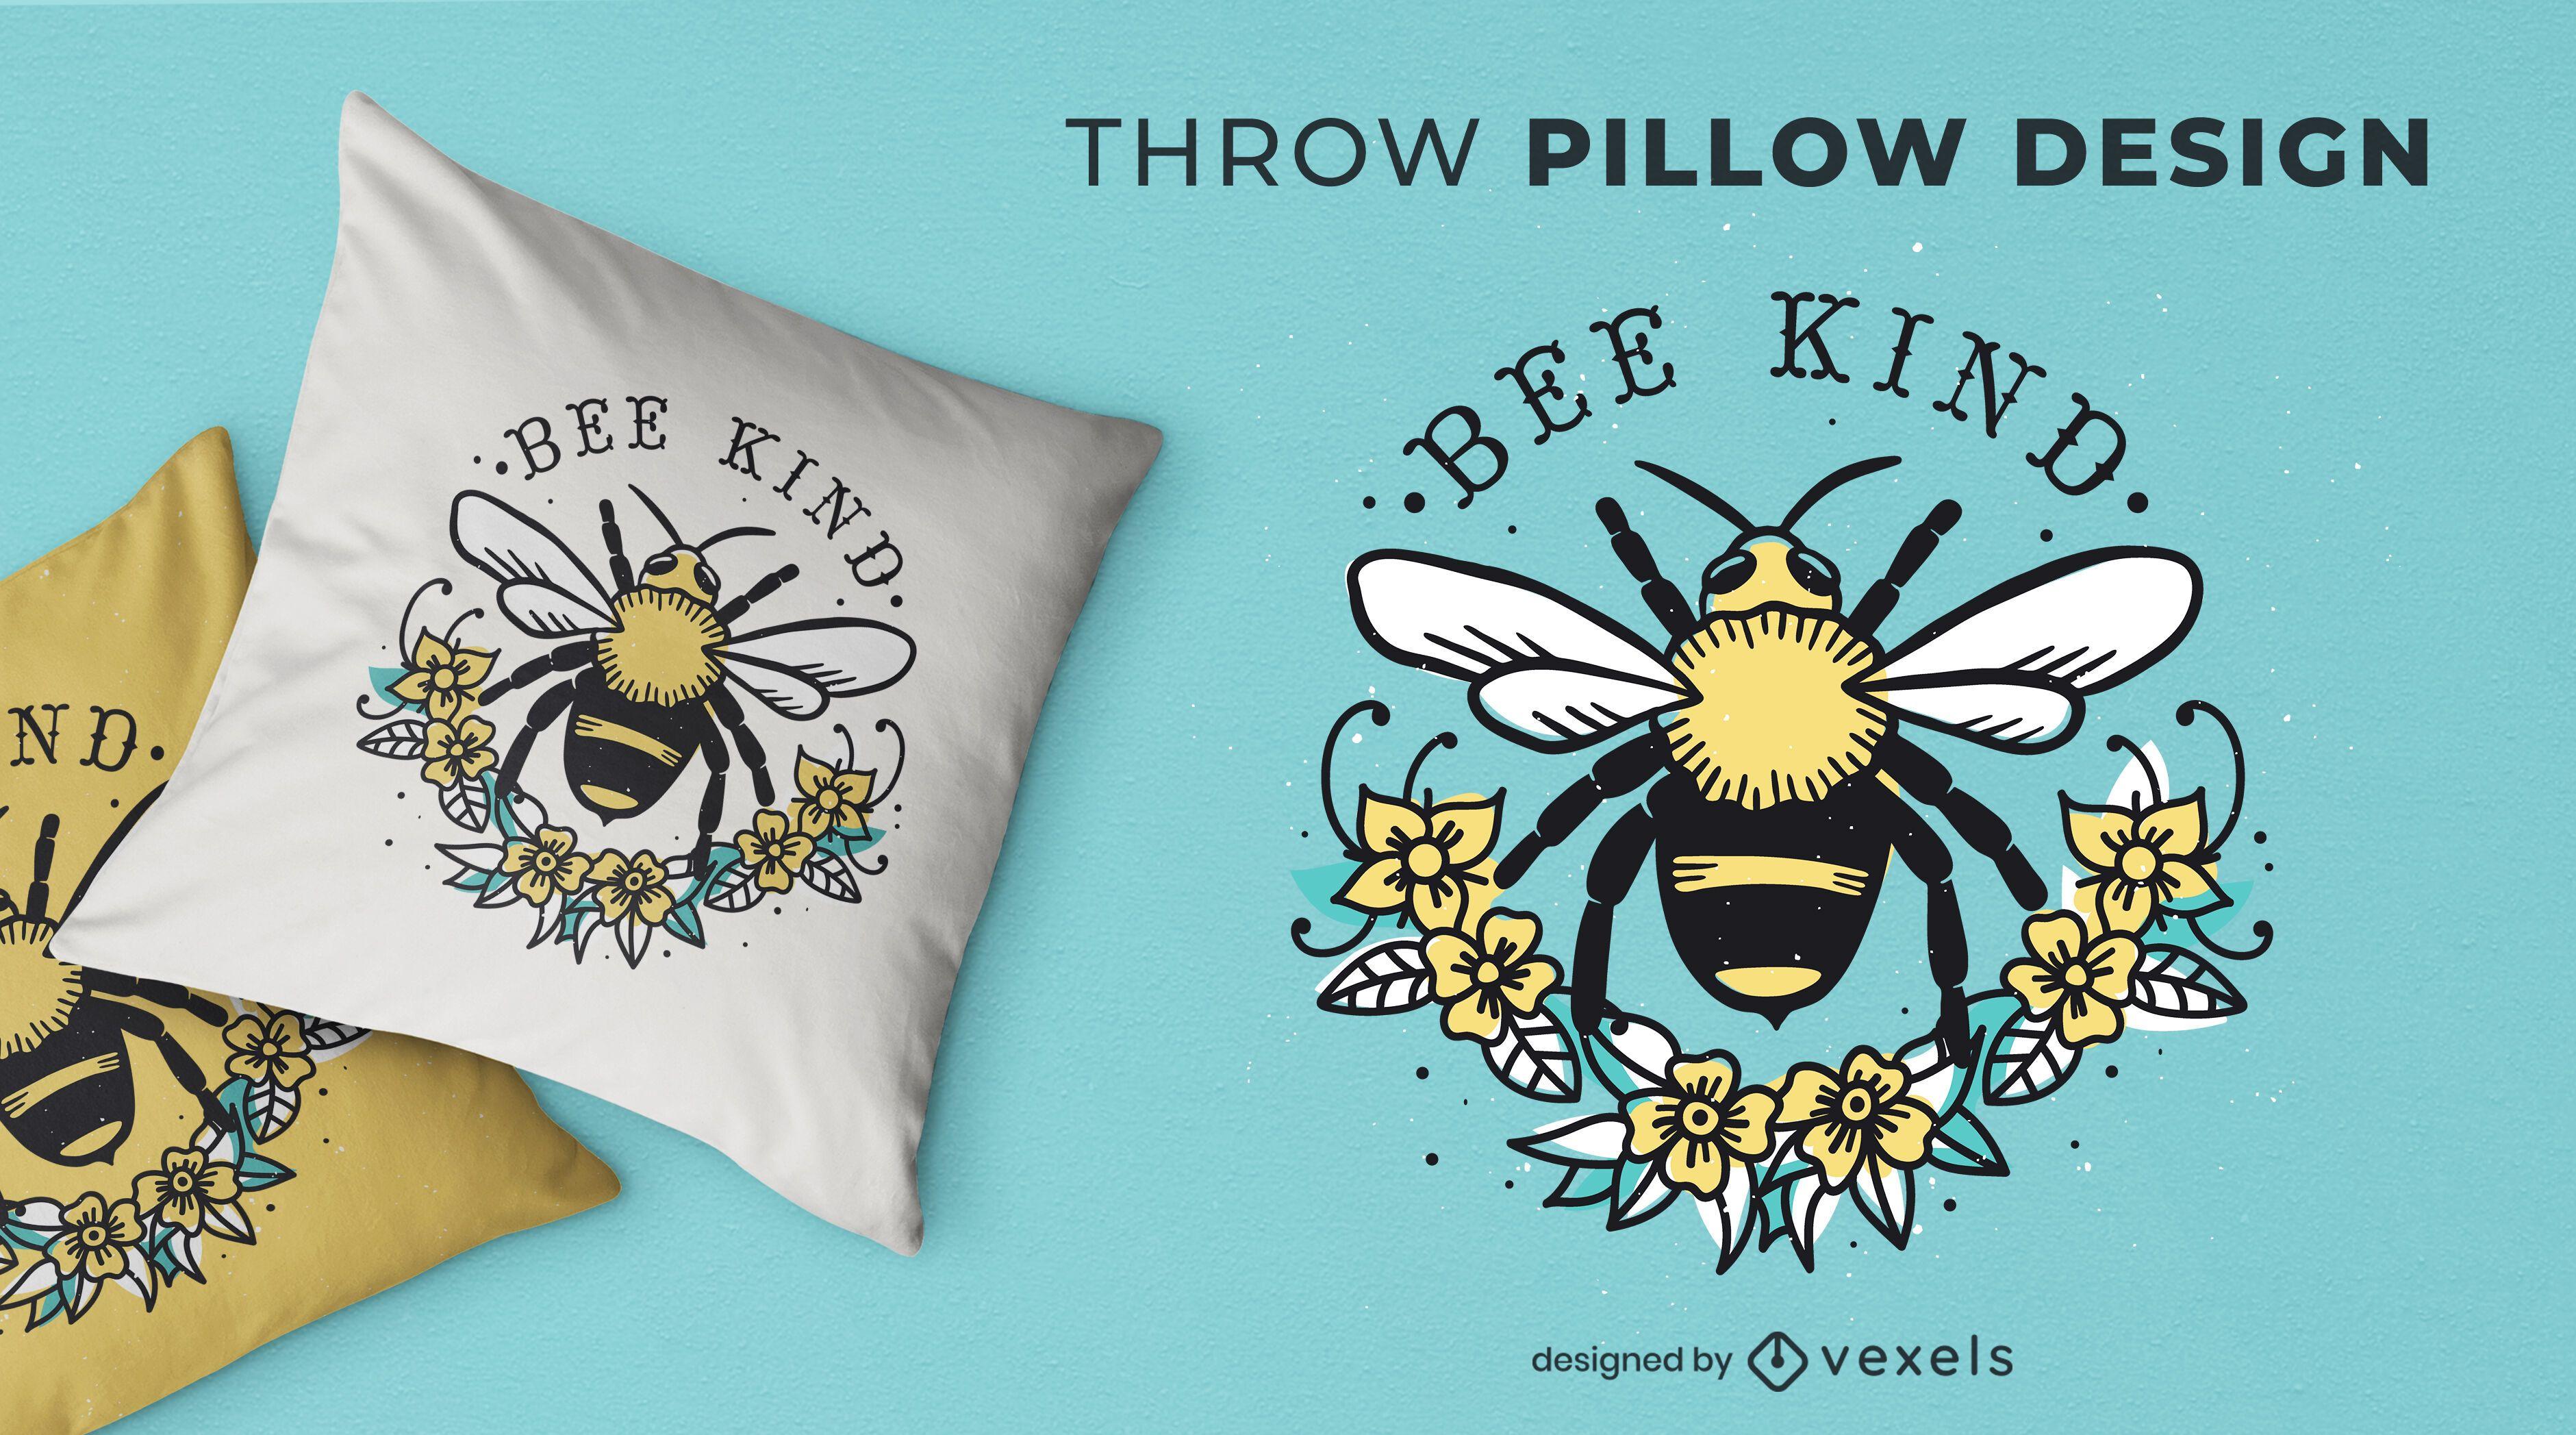 Bee kind throw pillow design